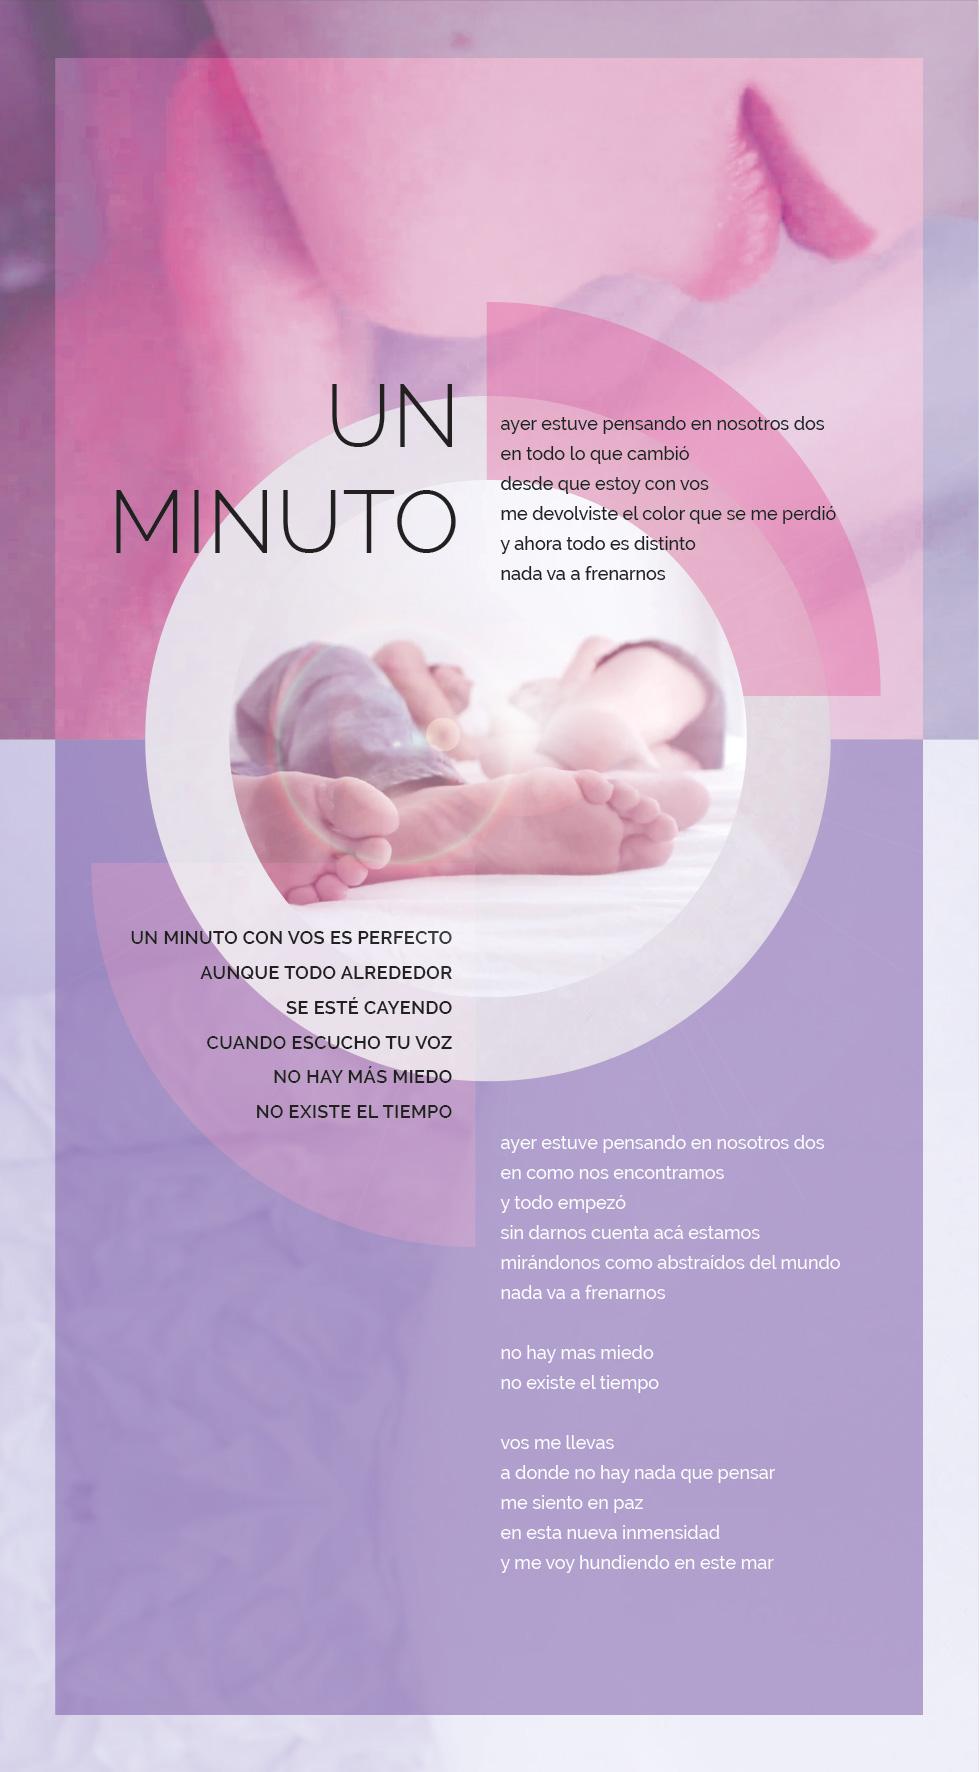 Olivia_Viggiano-Un_minuto.jpg